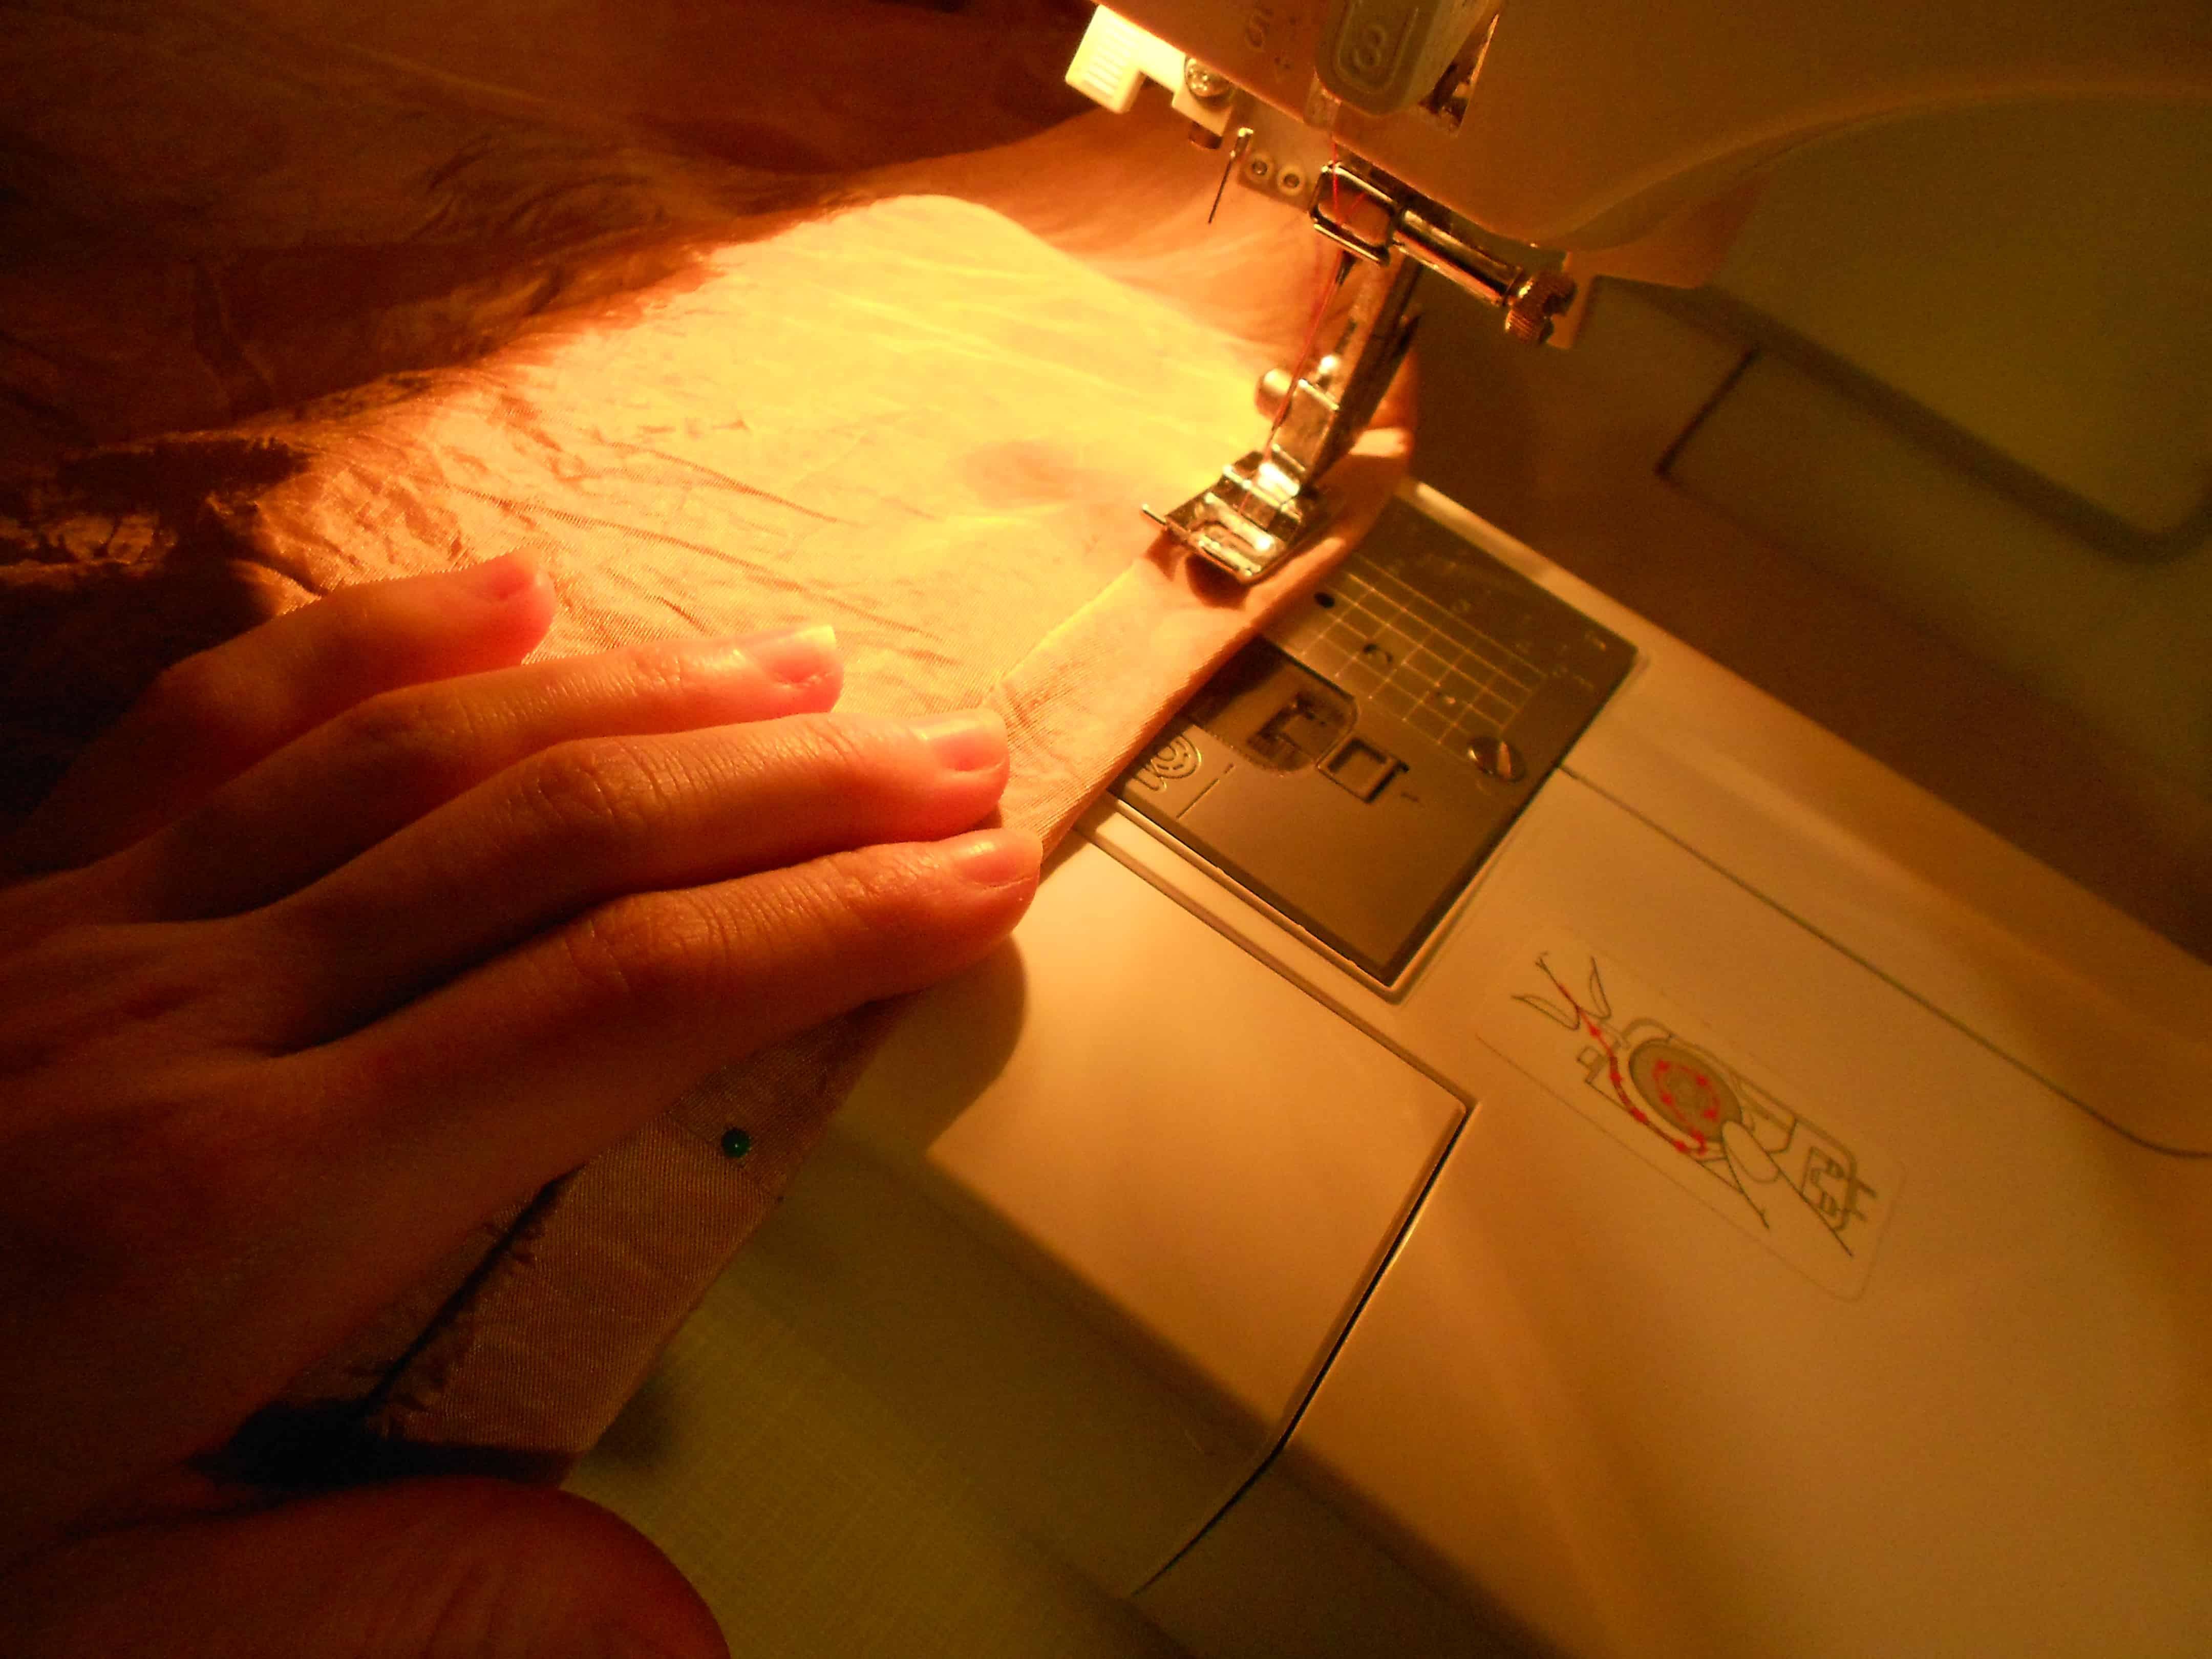 sewing hem